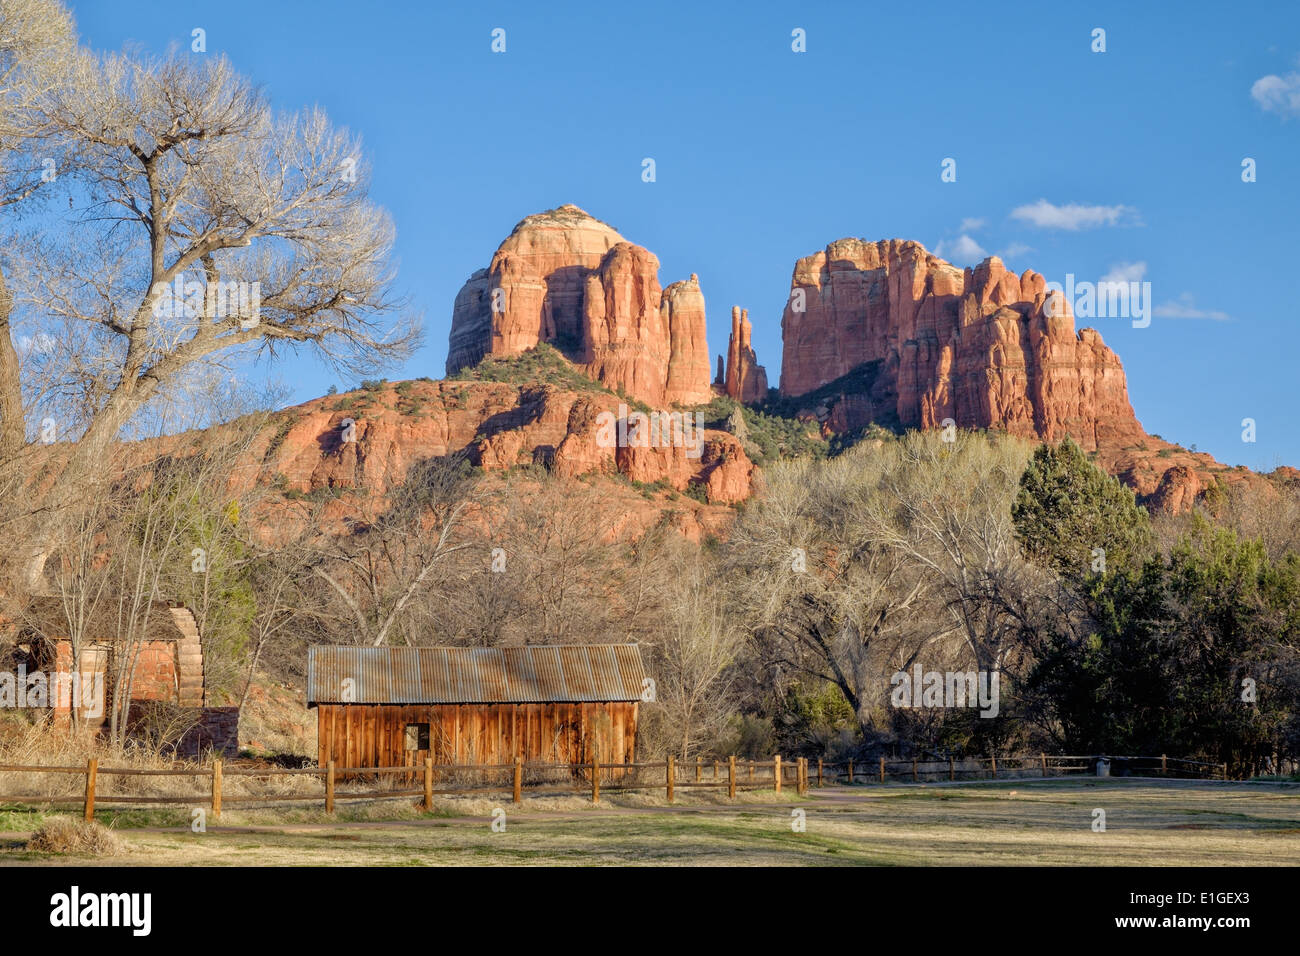 Cathedral Rock with an old water wheel and barn, at Sedona, Arizona, USA. - Stock Image